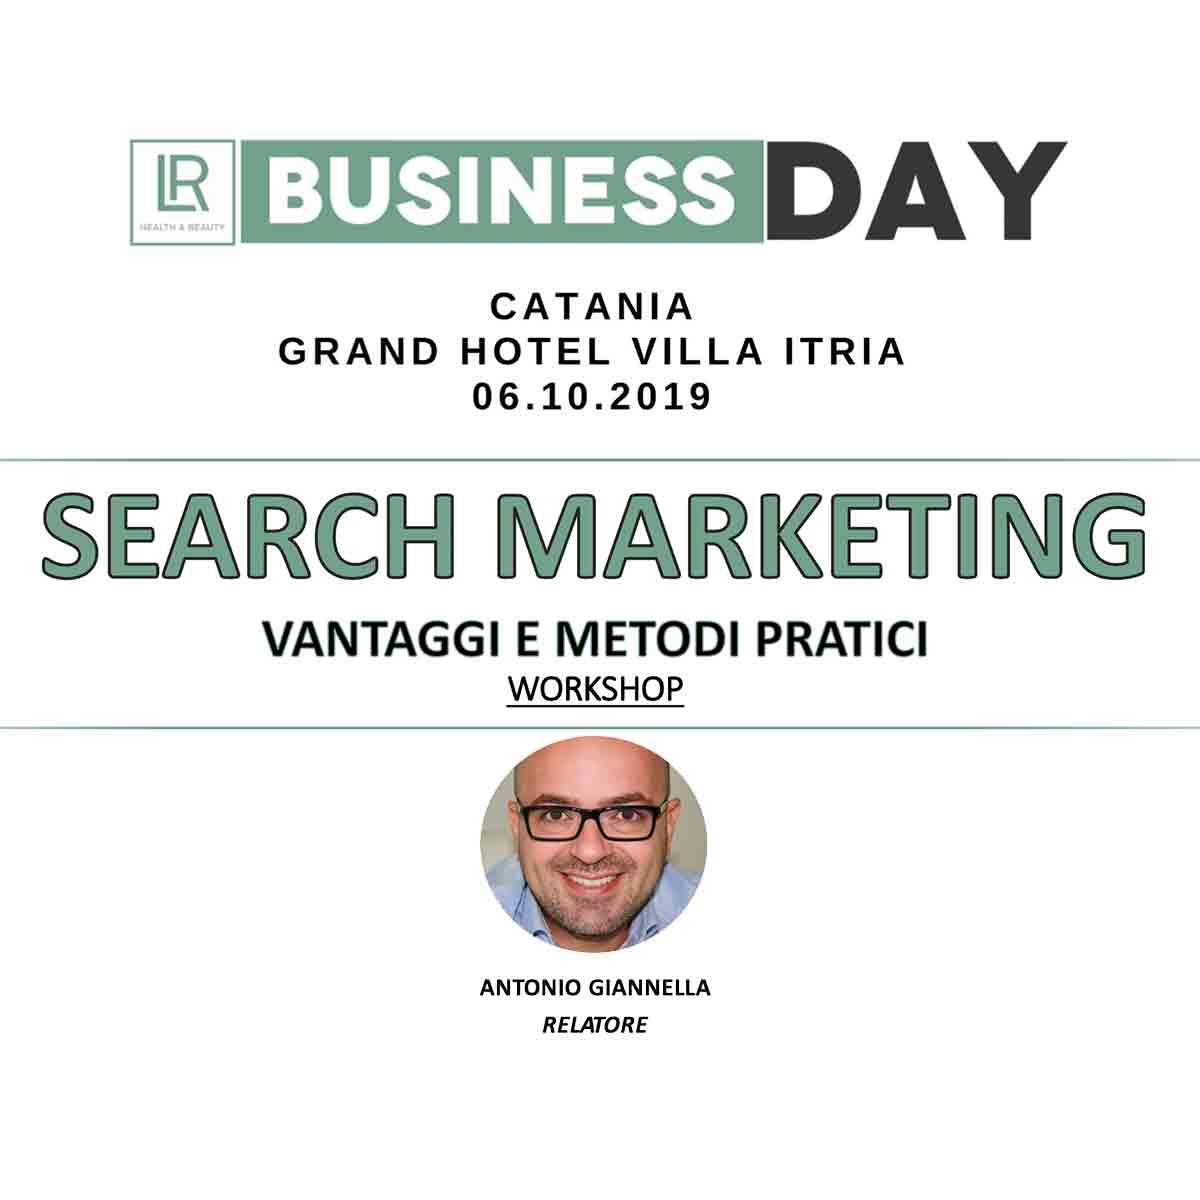 lr business day 2019 catania